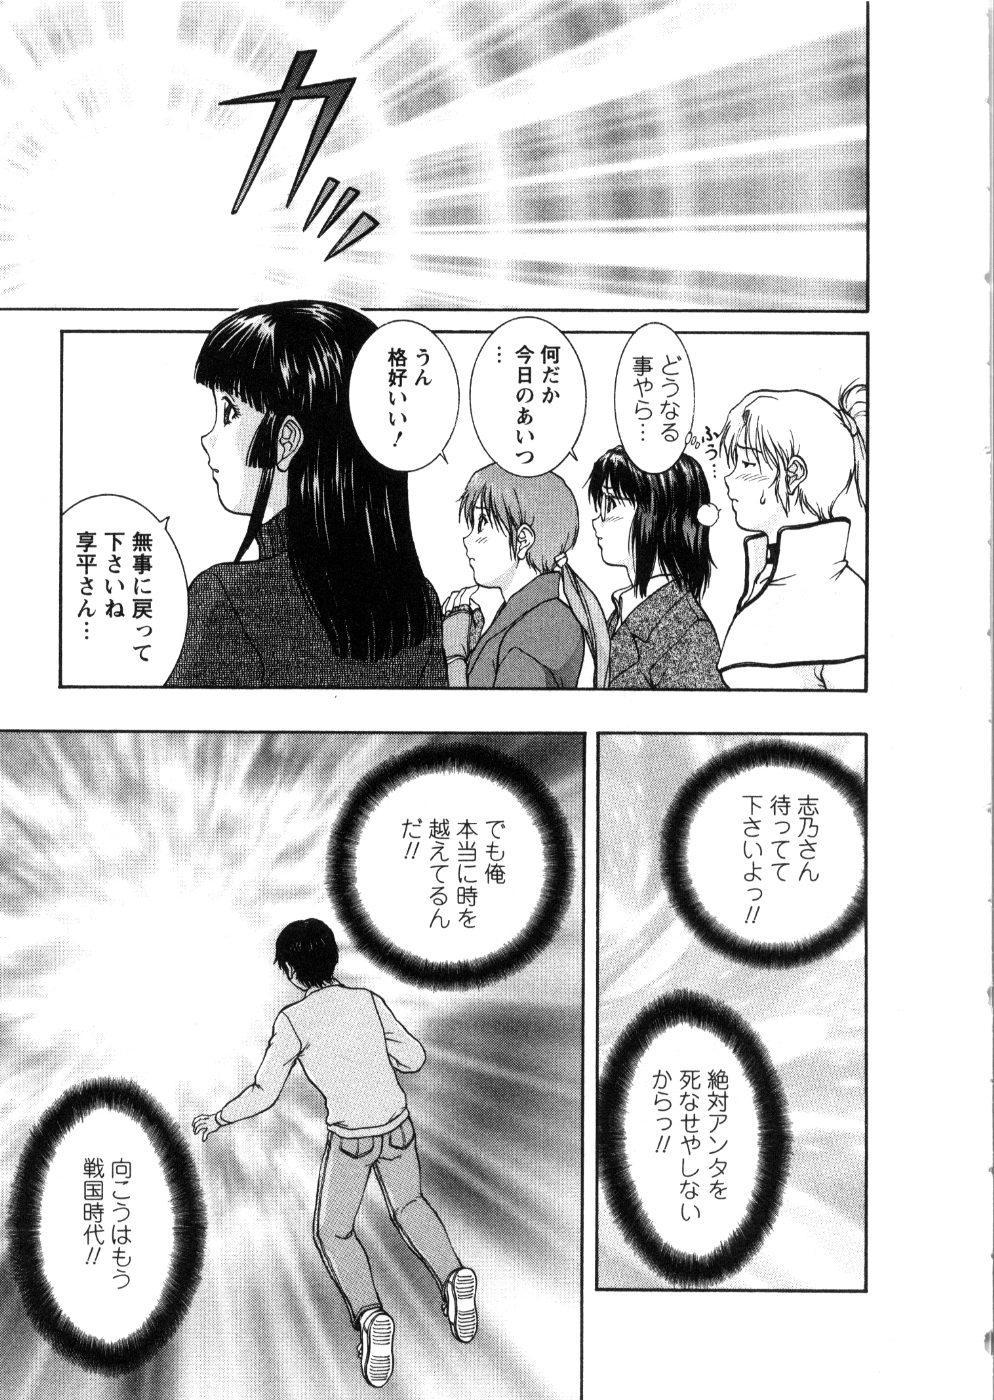 Oneechan-tachi ga Yatte Kuru 03 22